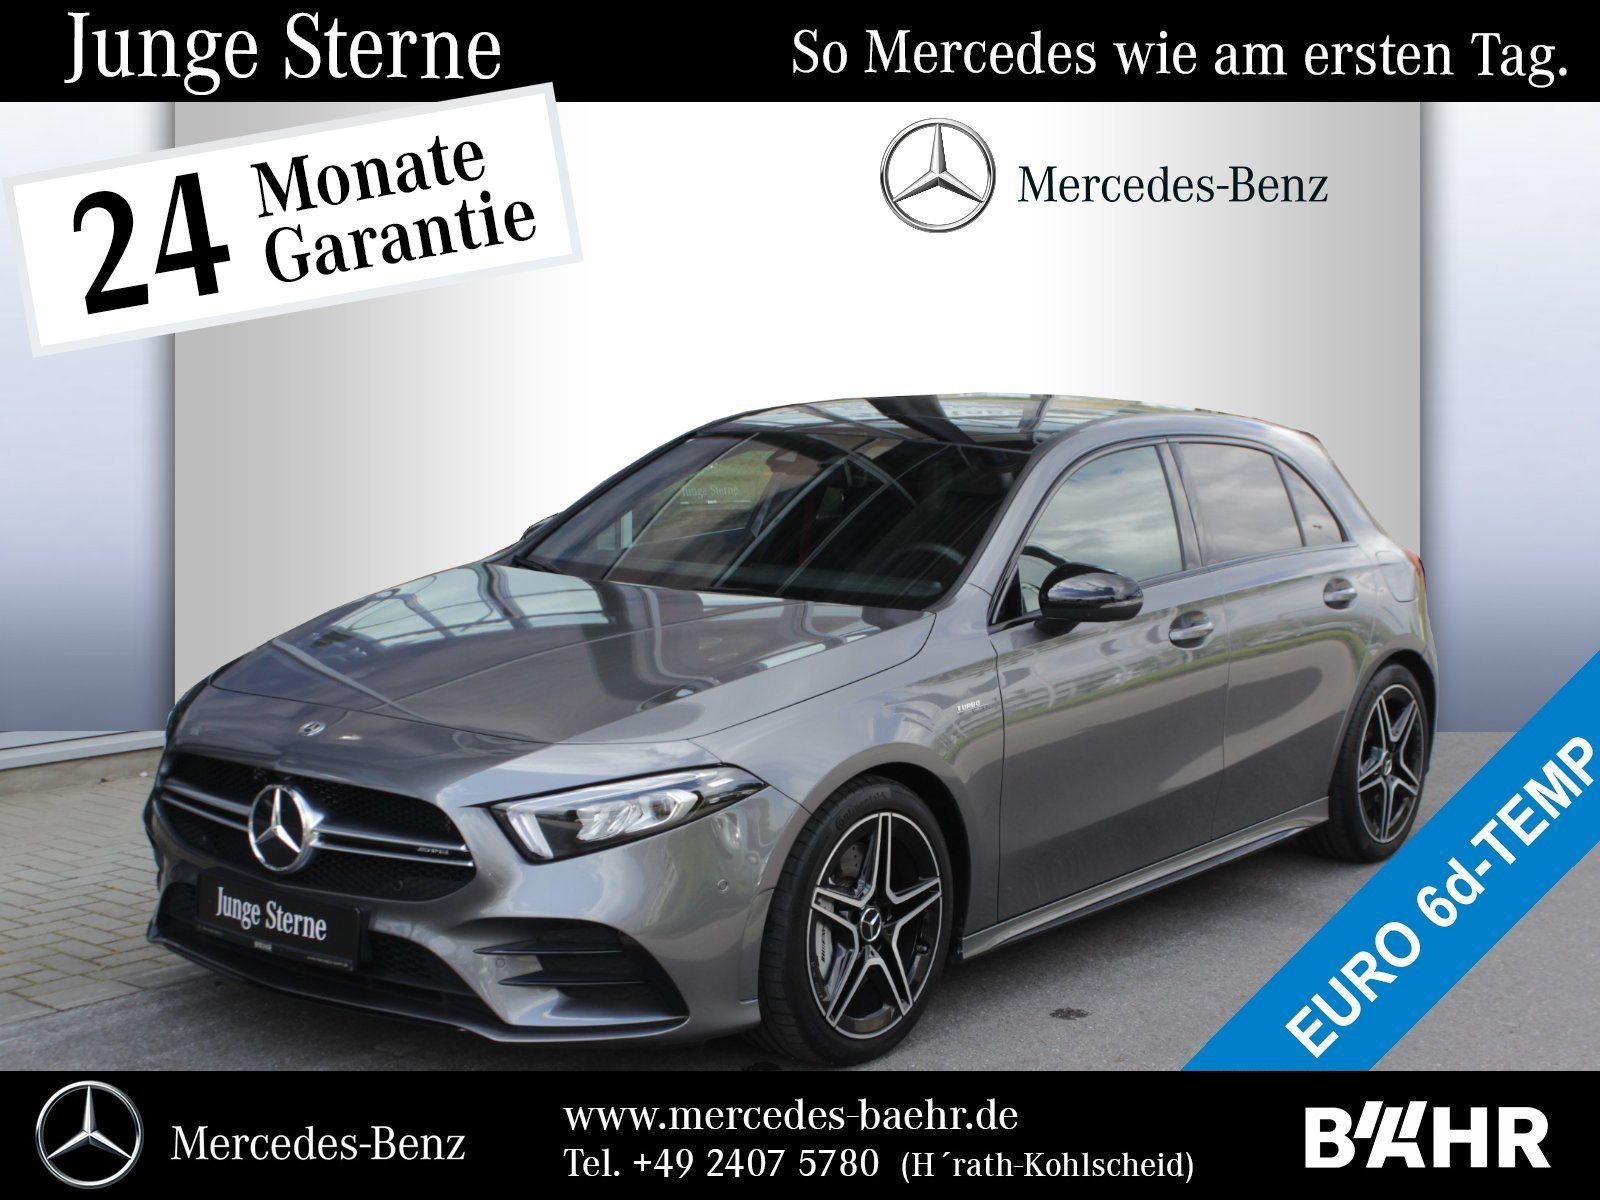 Mercedes-Benz A 35 AMG 4M Night/MBUX-Navi-Premium/LED/Pano/RFK, Jahr 2019, Benzin